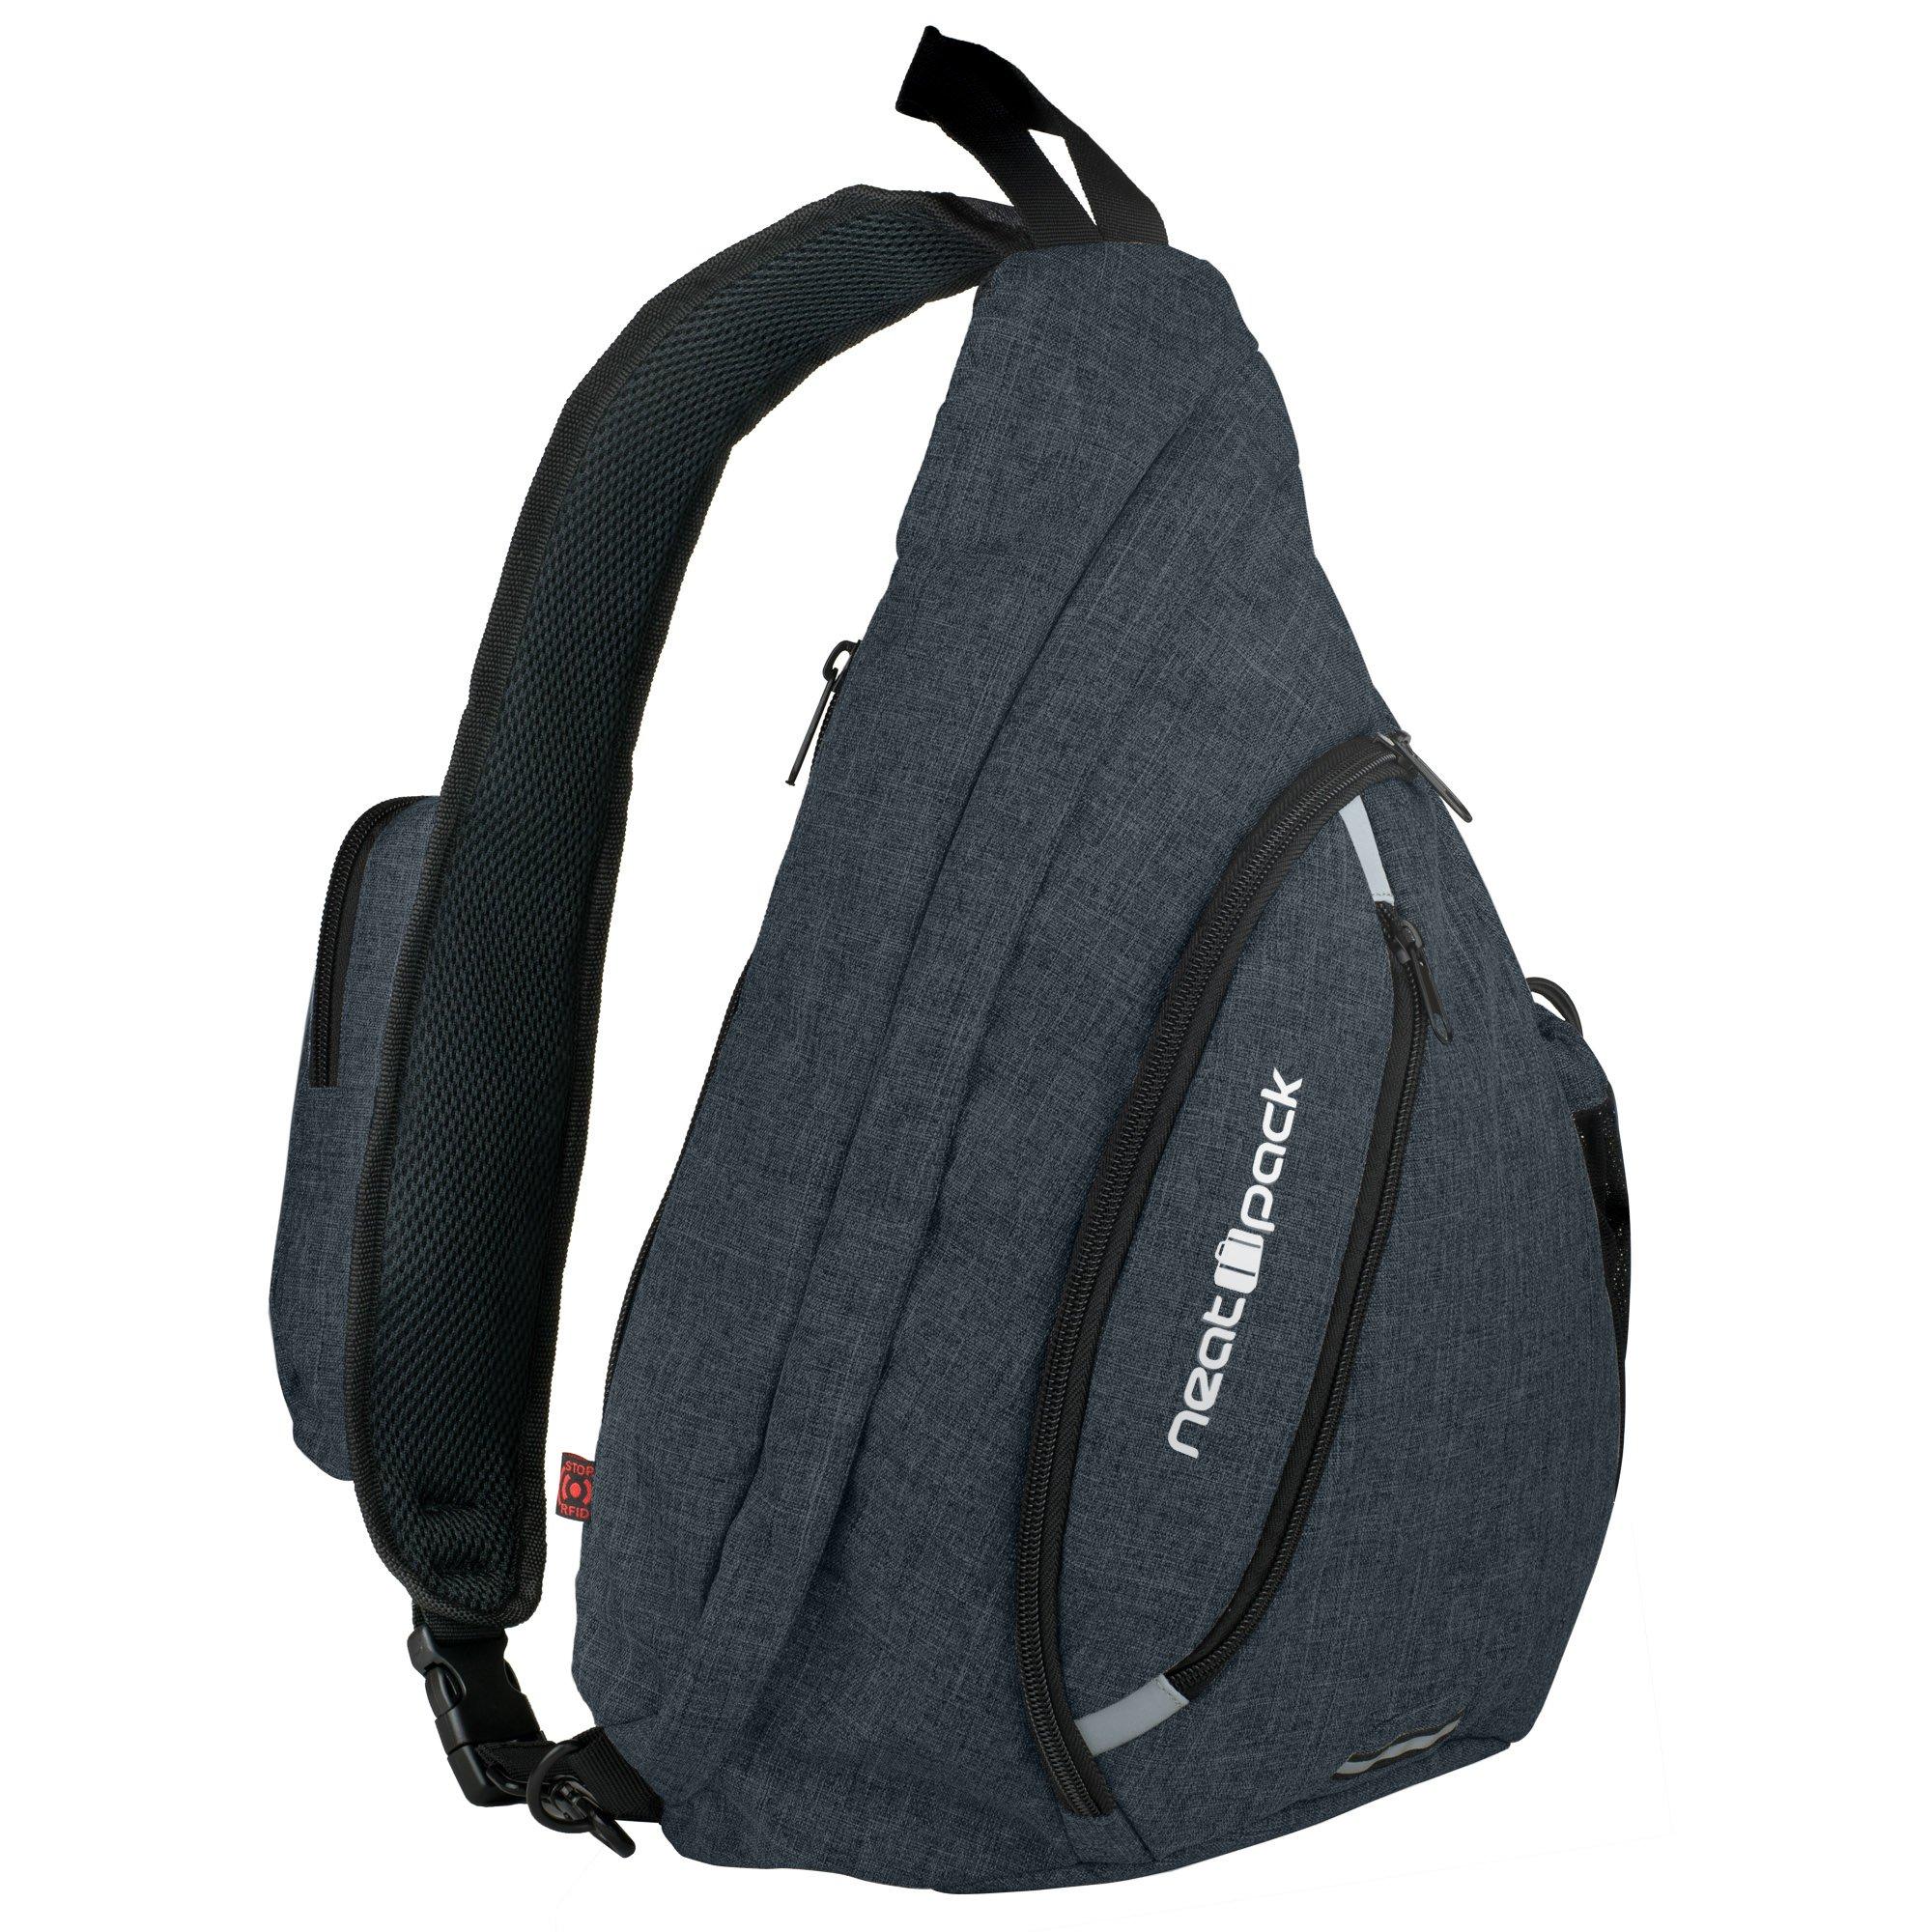 Versatile Canvas Sling Bag/Urban Travel Backpack, Black | Wear Over Shoulder or Crossbody for Men & Women, by NeatPack